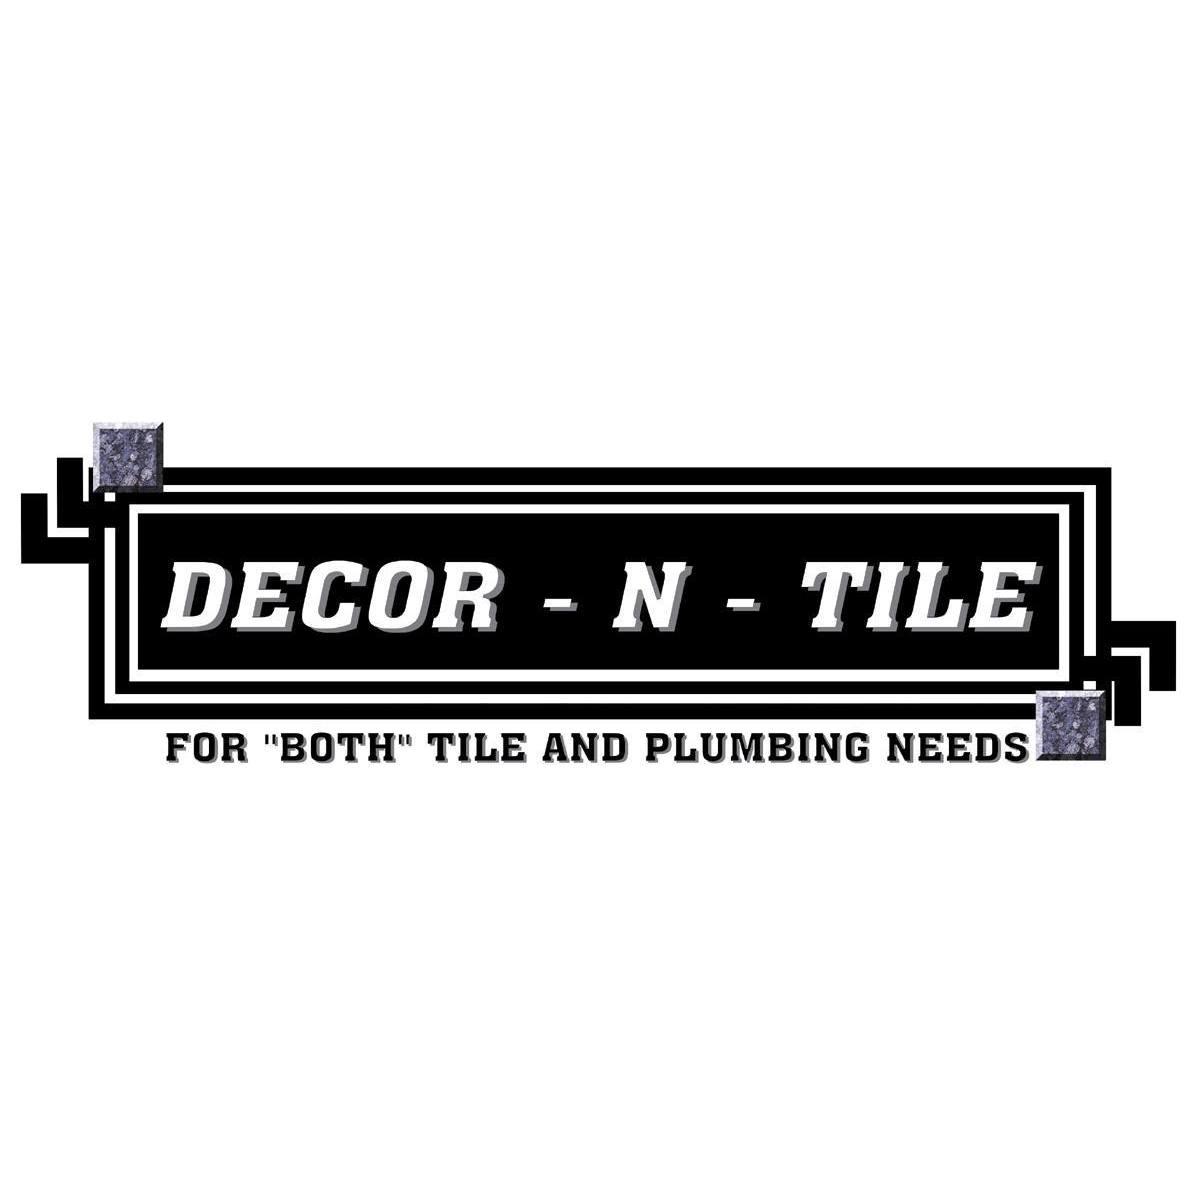 Decor N Tile